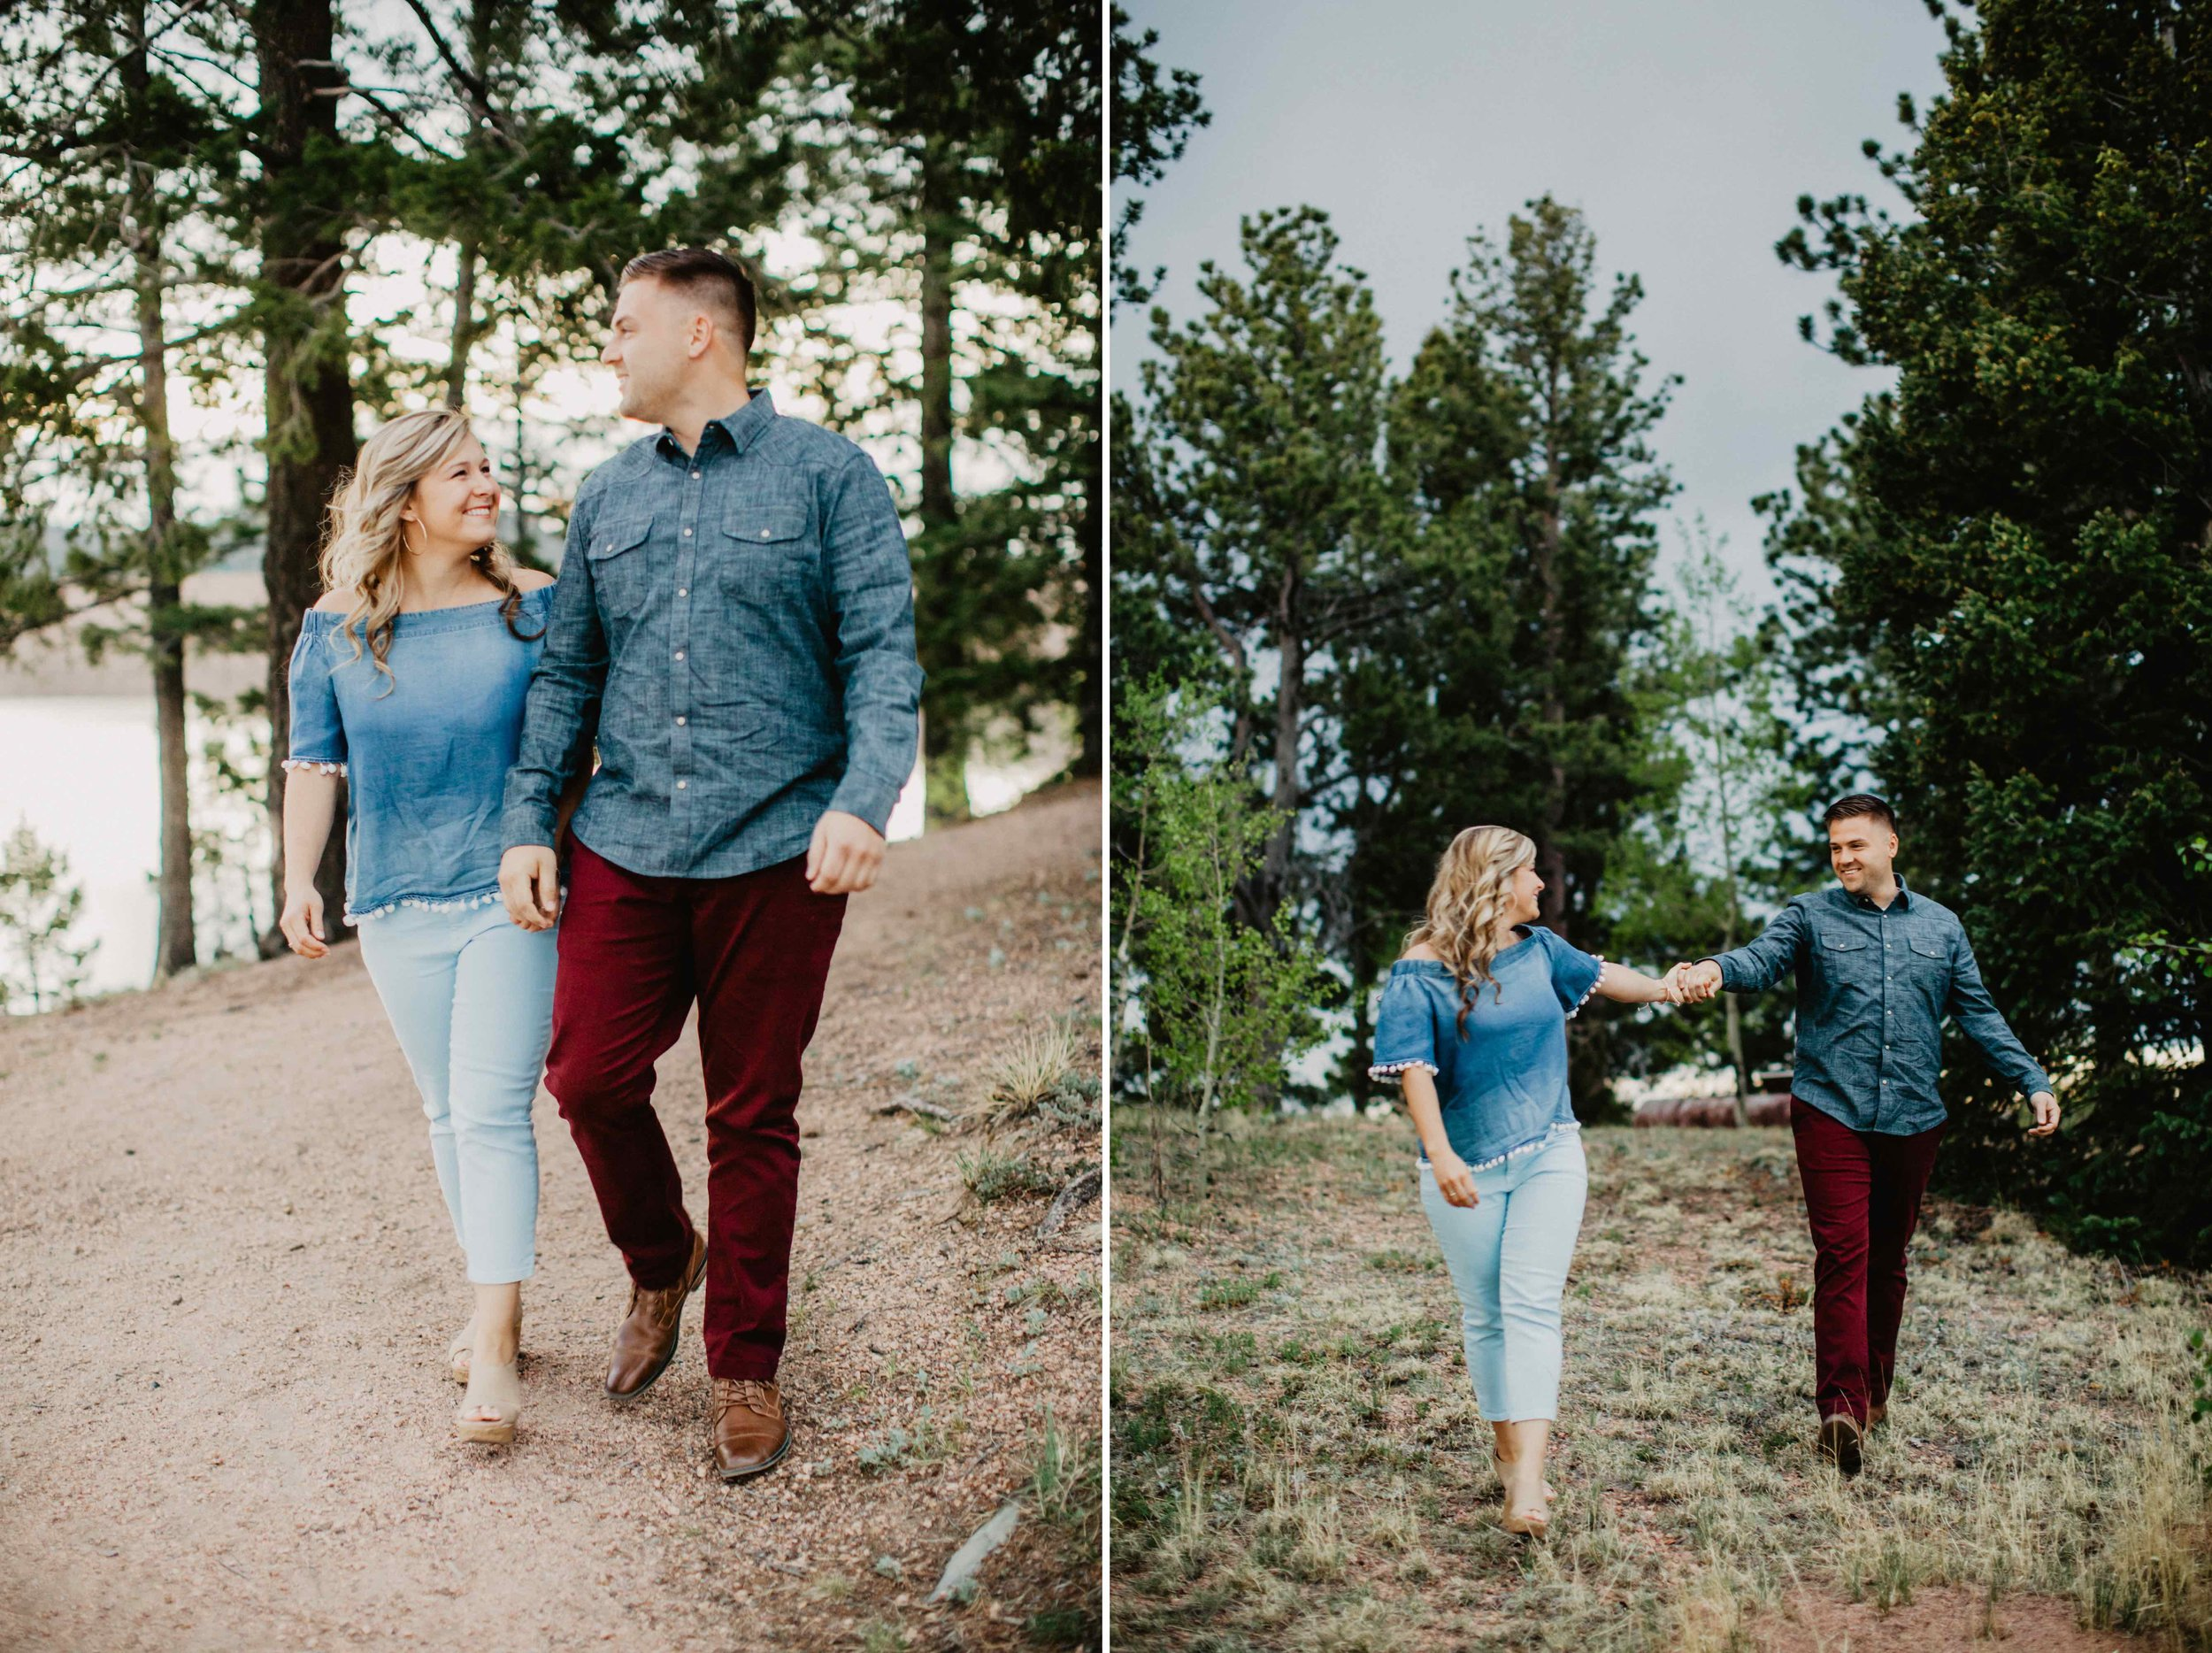 Kisa Conrad Favorites-0001-colorado-wedding-photographer-denver-springs-vail-.jpeg